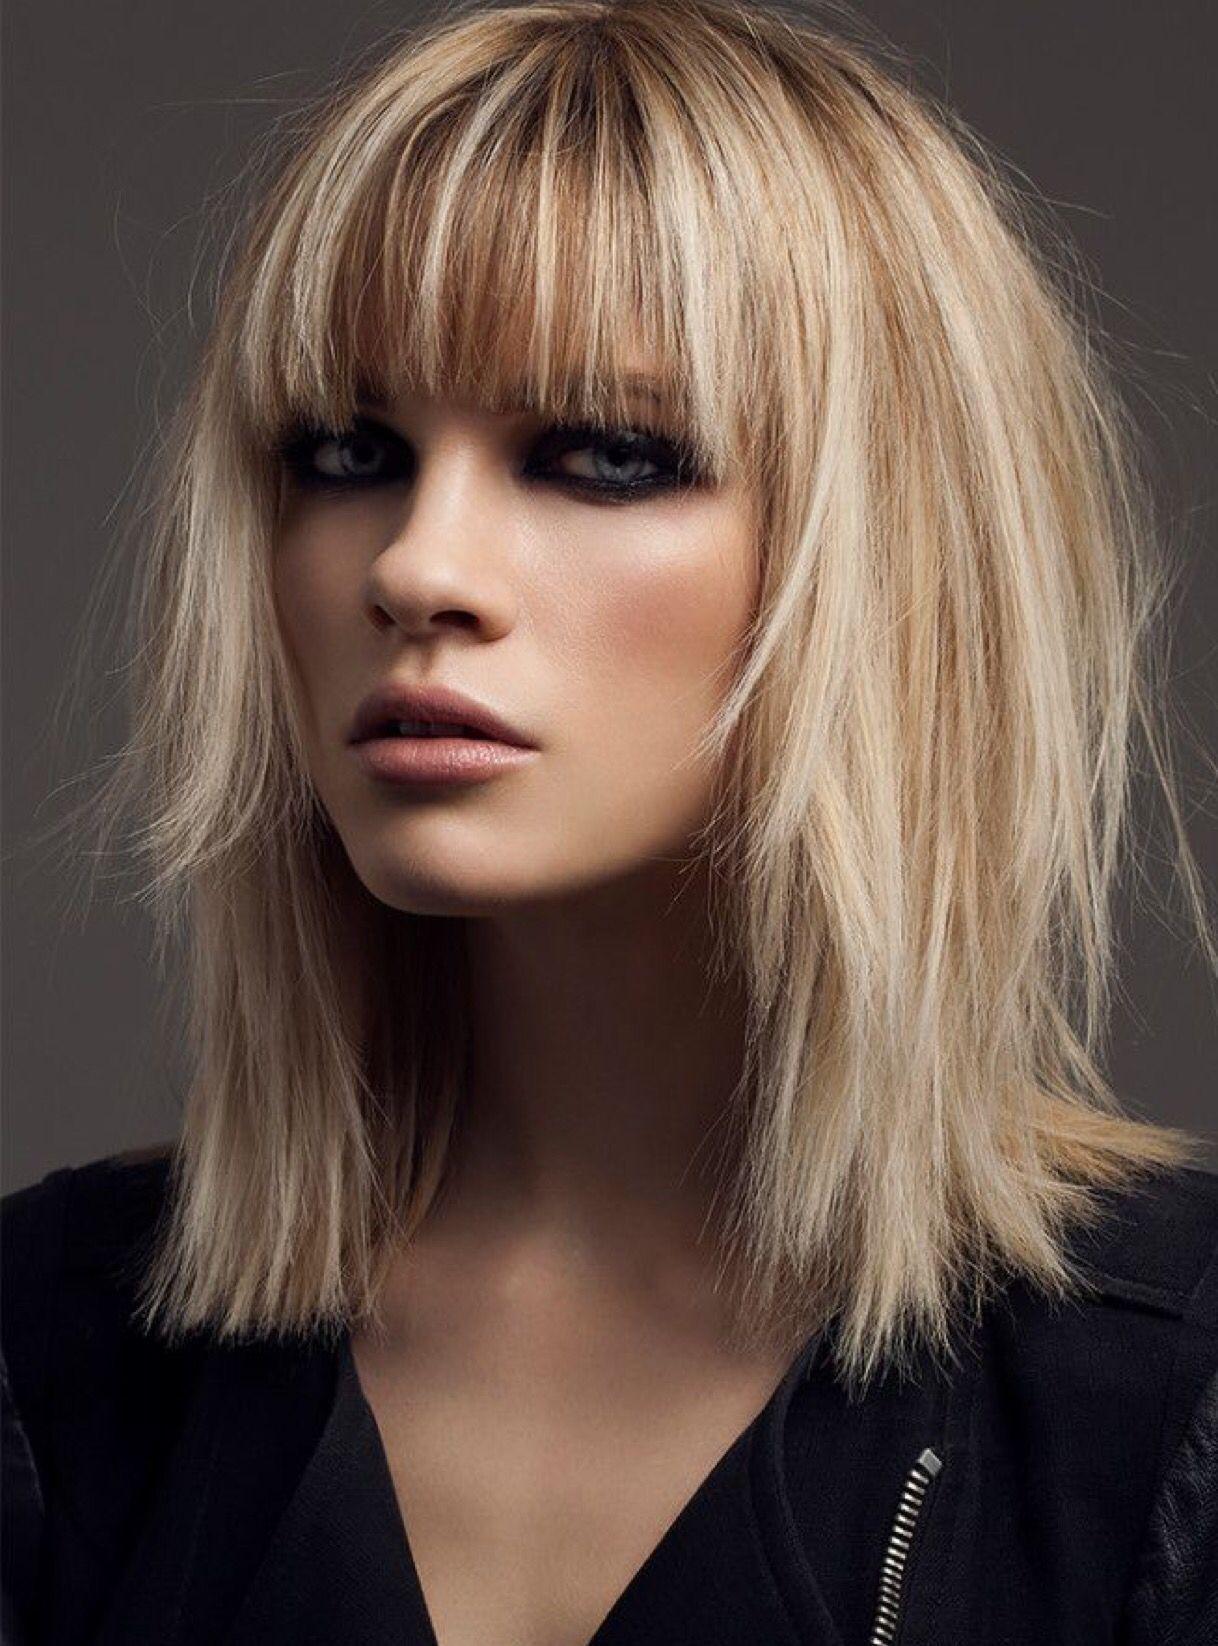 mens thin hairstyles women's short thin hairstyles  ...